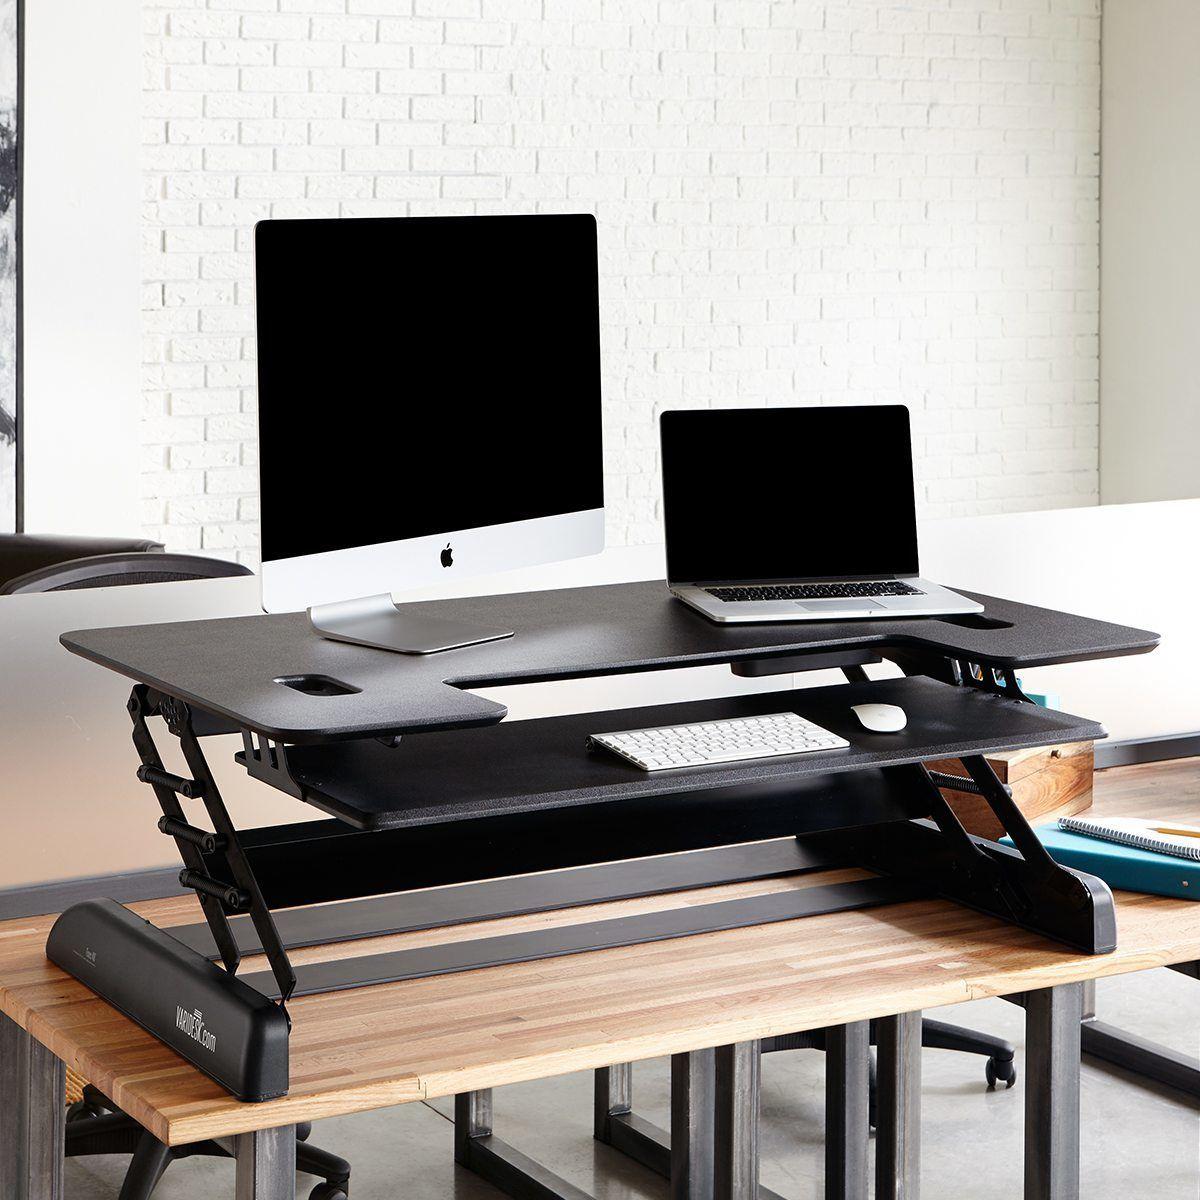 Varidesk review standing desks epic reviews - Standing Desk Products Varidesk Sit To Stand Desks